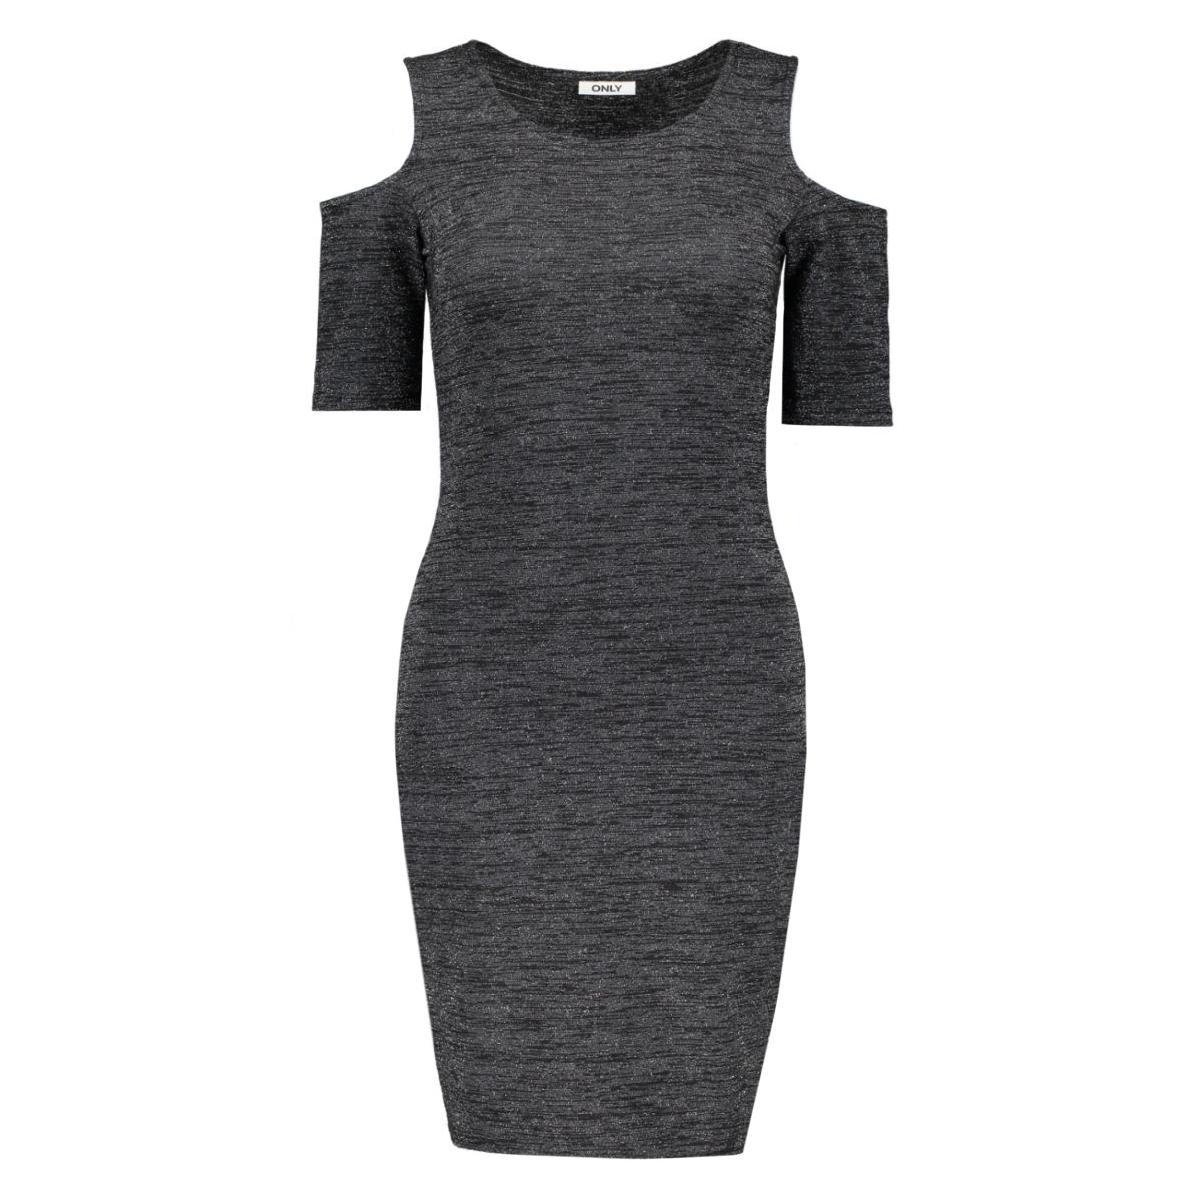 onlroma lurex 2/4 short dress jrs 15126114 only jurk black/with silver